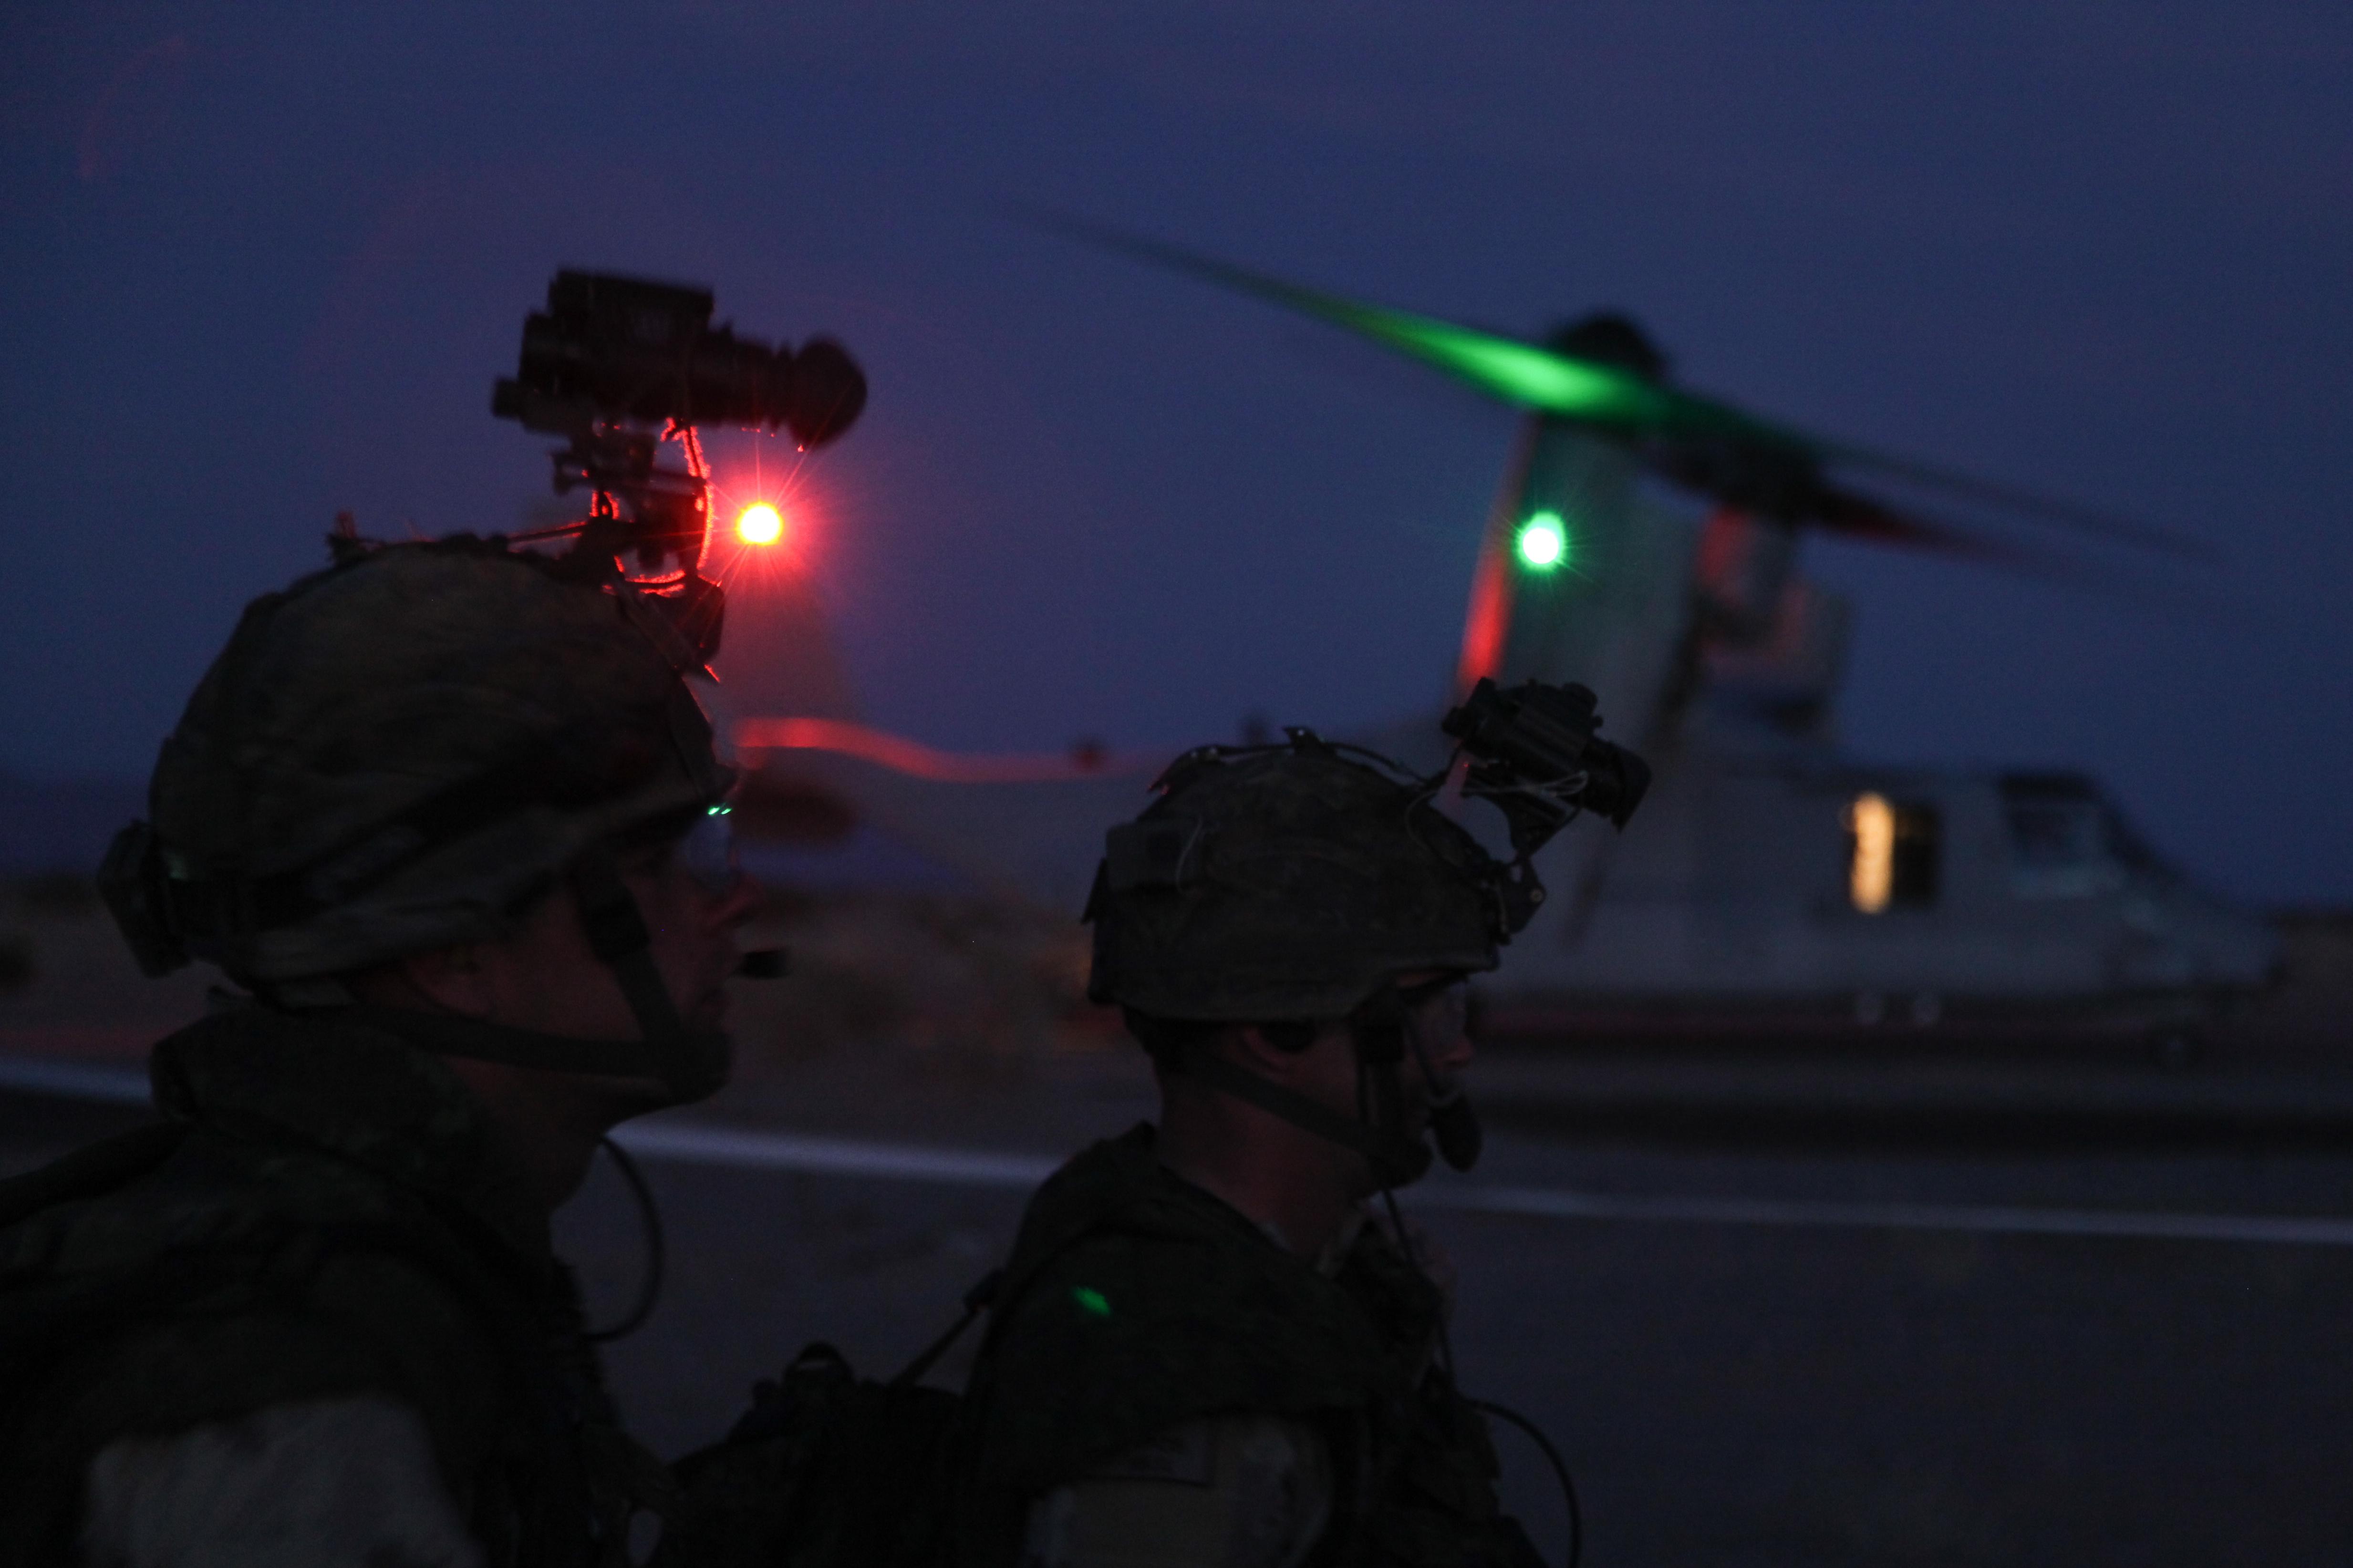 Soldiers with 3rd Battalion Royal Canadian Regiment prepare to load onto USMC MV-22 Ospreys near Yuma, Ariz., April 18, 2012